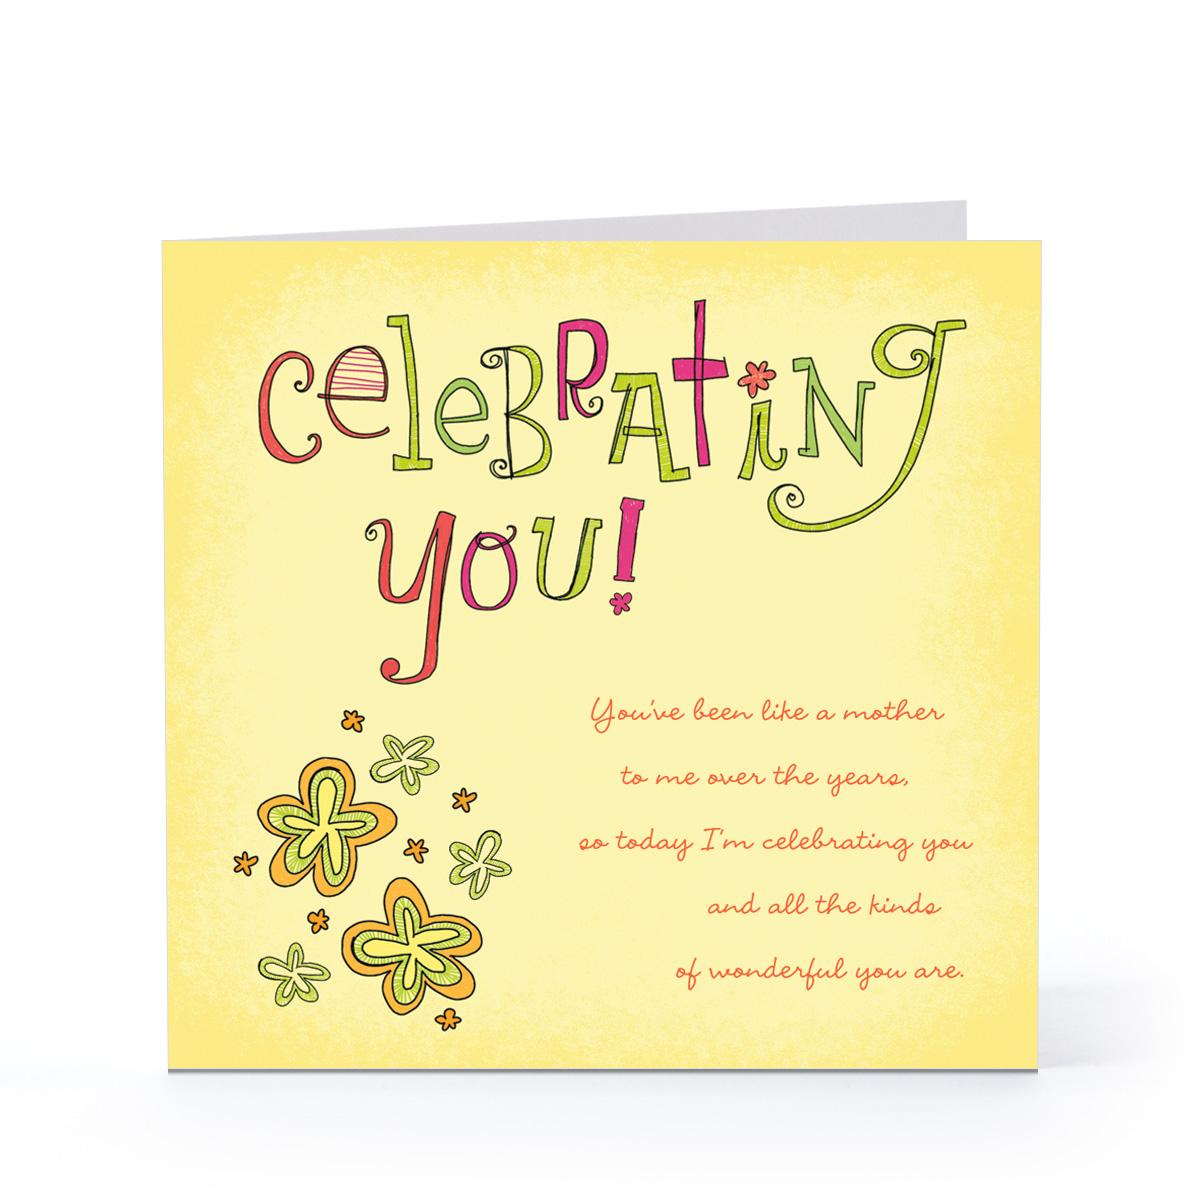 Doc Hallmark E Birthday Cards Funny Ecards Birthday Free – Free Online Birthday Cards Hallmark